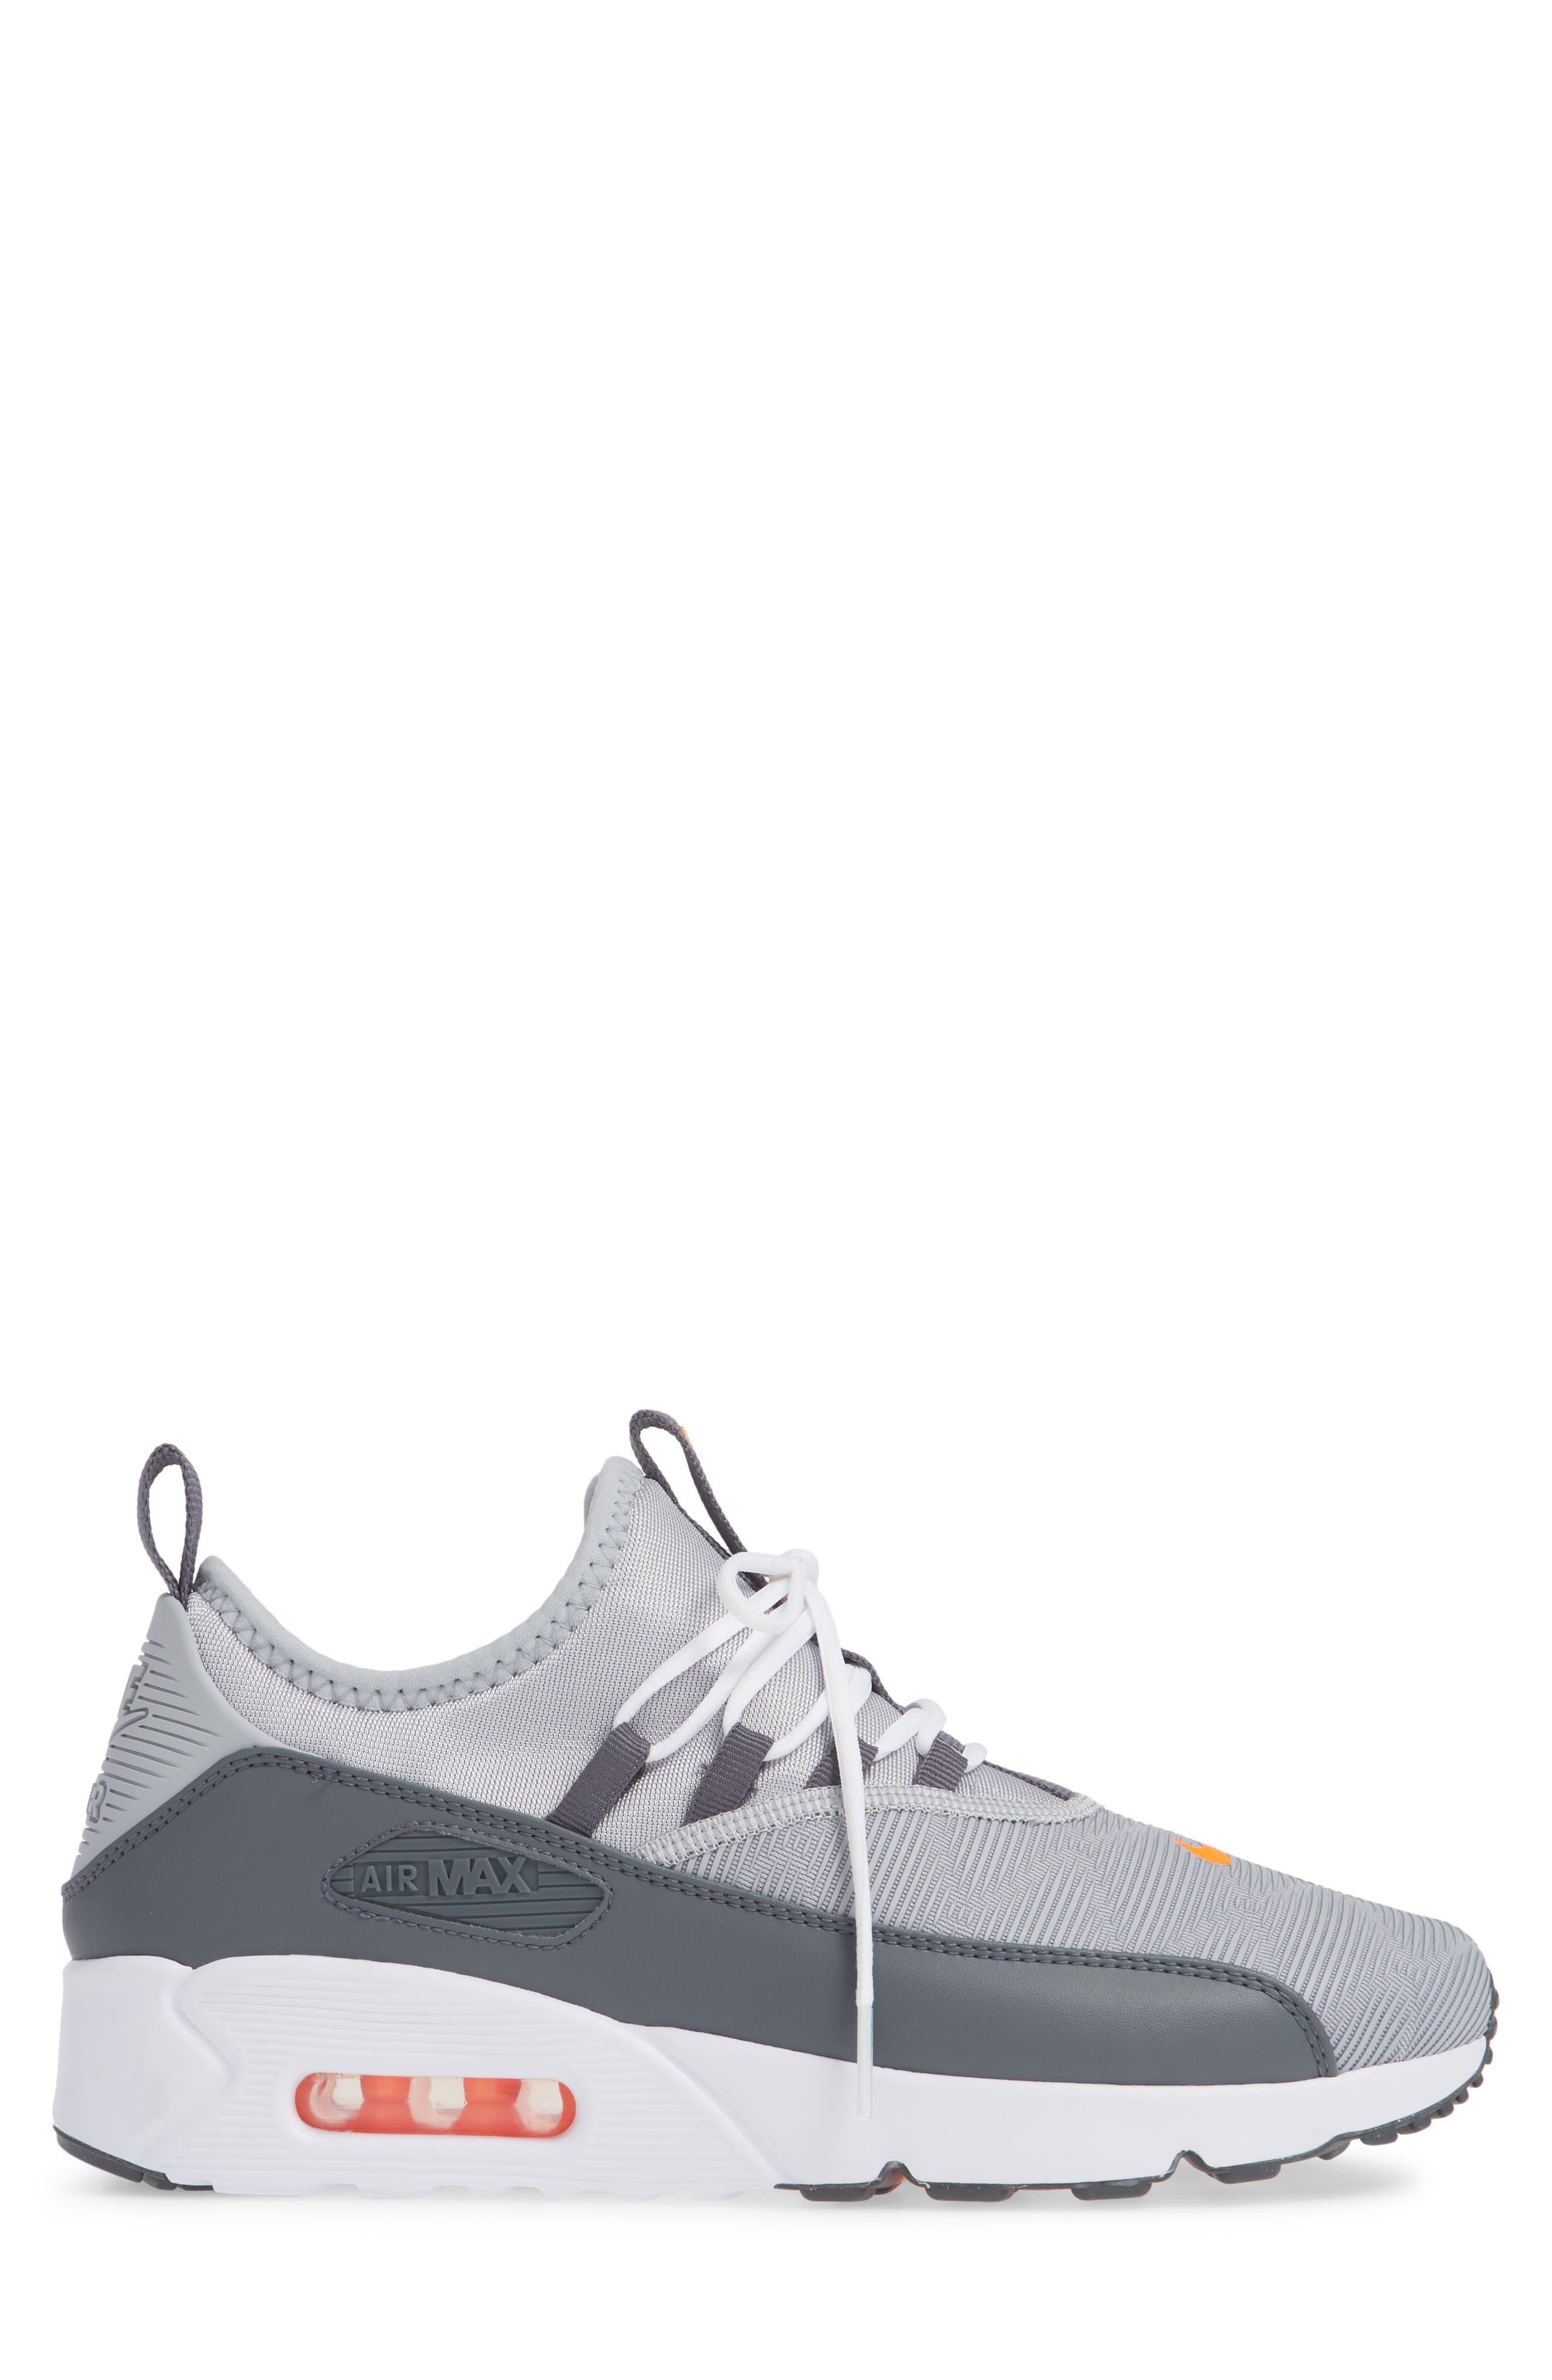 Air Max 90 EZ Sneaker,                             Alternate thumbnail 3, color,                             WOLF GREY/ TOTAL ORANGE/ WHITE